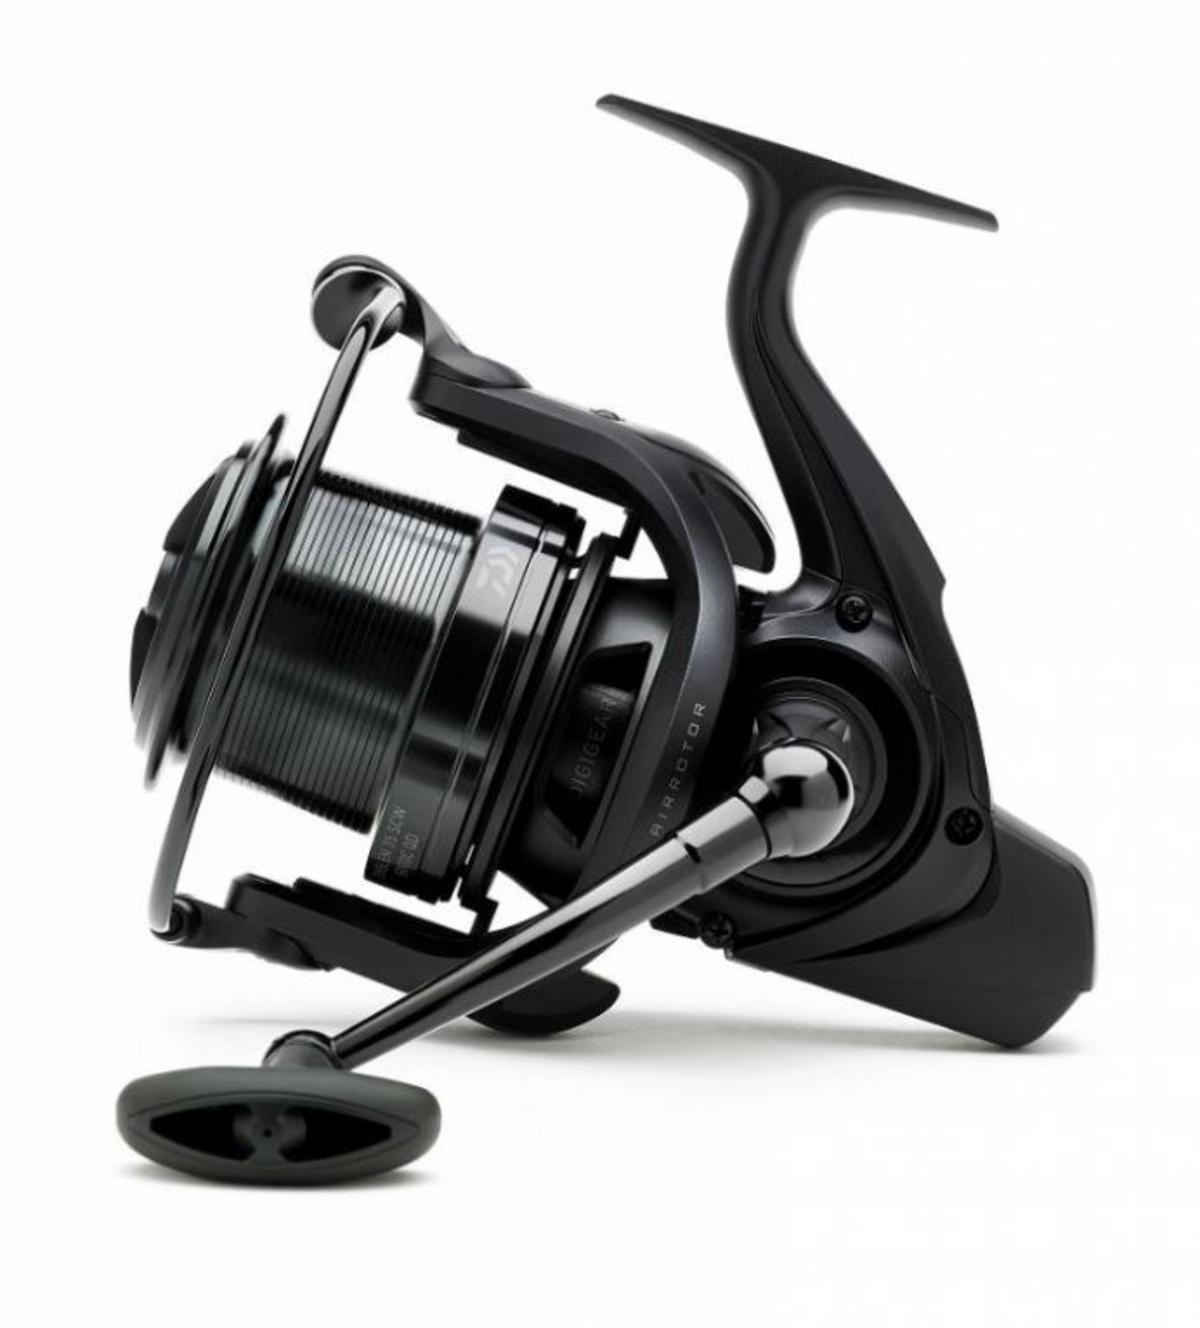 Ex Display Daiwa 18 Emblem 35 SCW 5000C QD Carp Fishing Reel - 18EM35SCW5000CQD